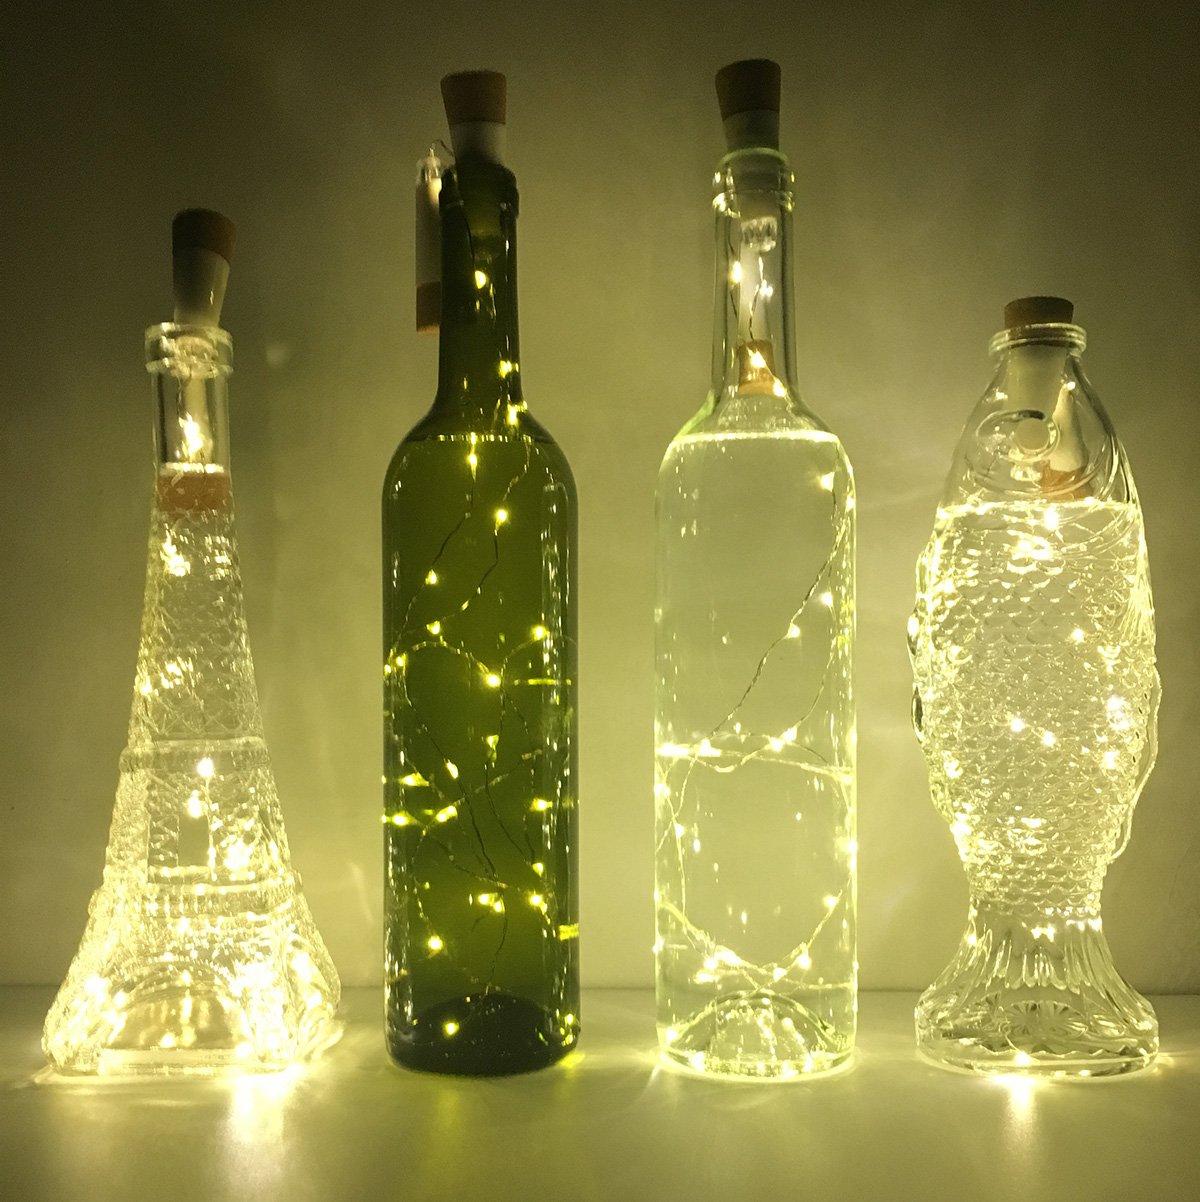 Amazoncom NeoJoy Wine Cork Lights Rechargeable